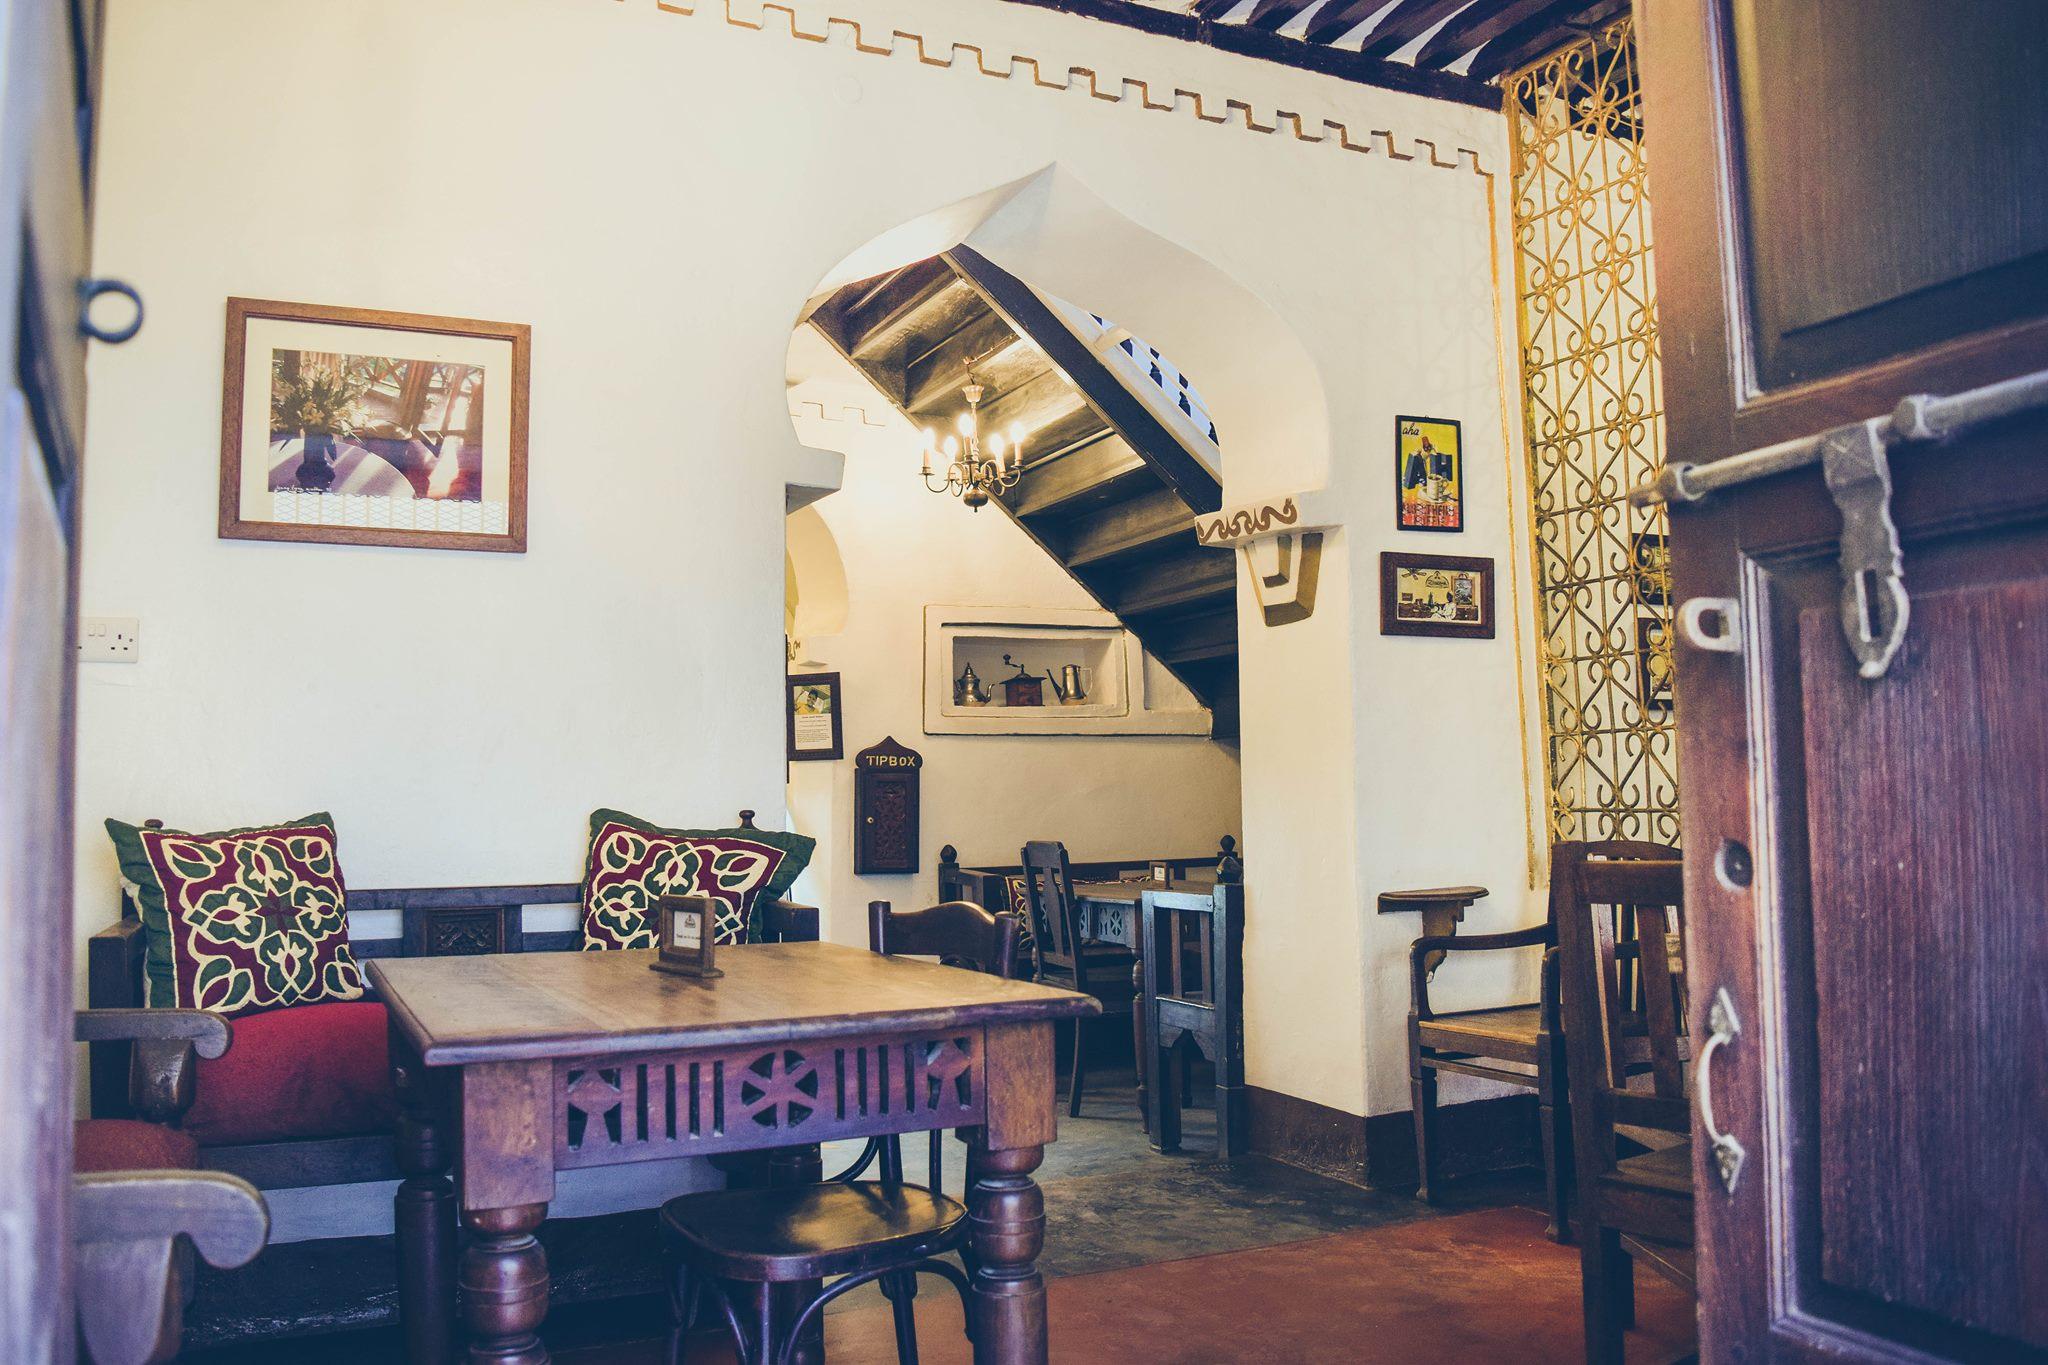 Photo Courtesy of  Zanzibar Coffee House